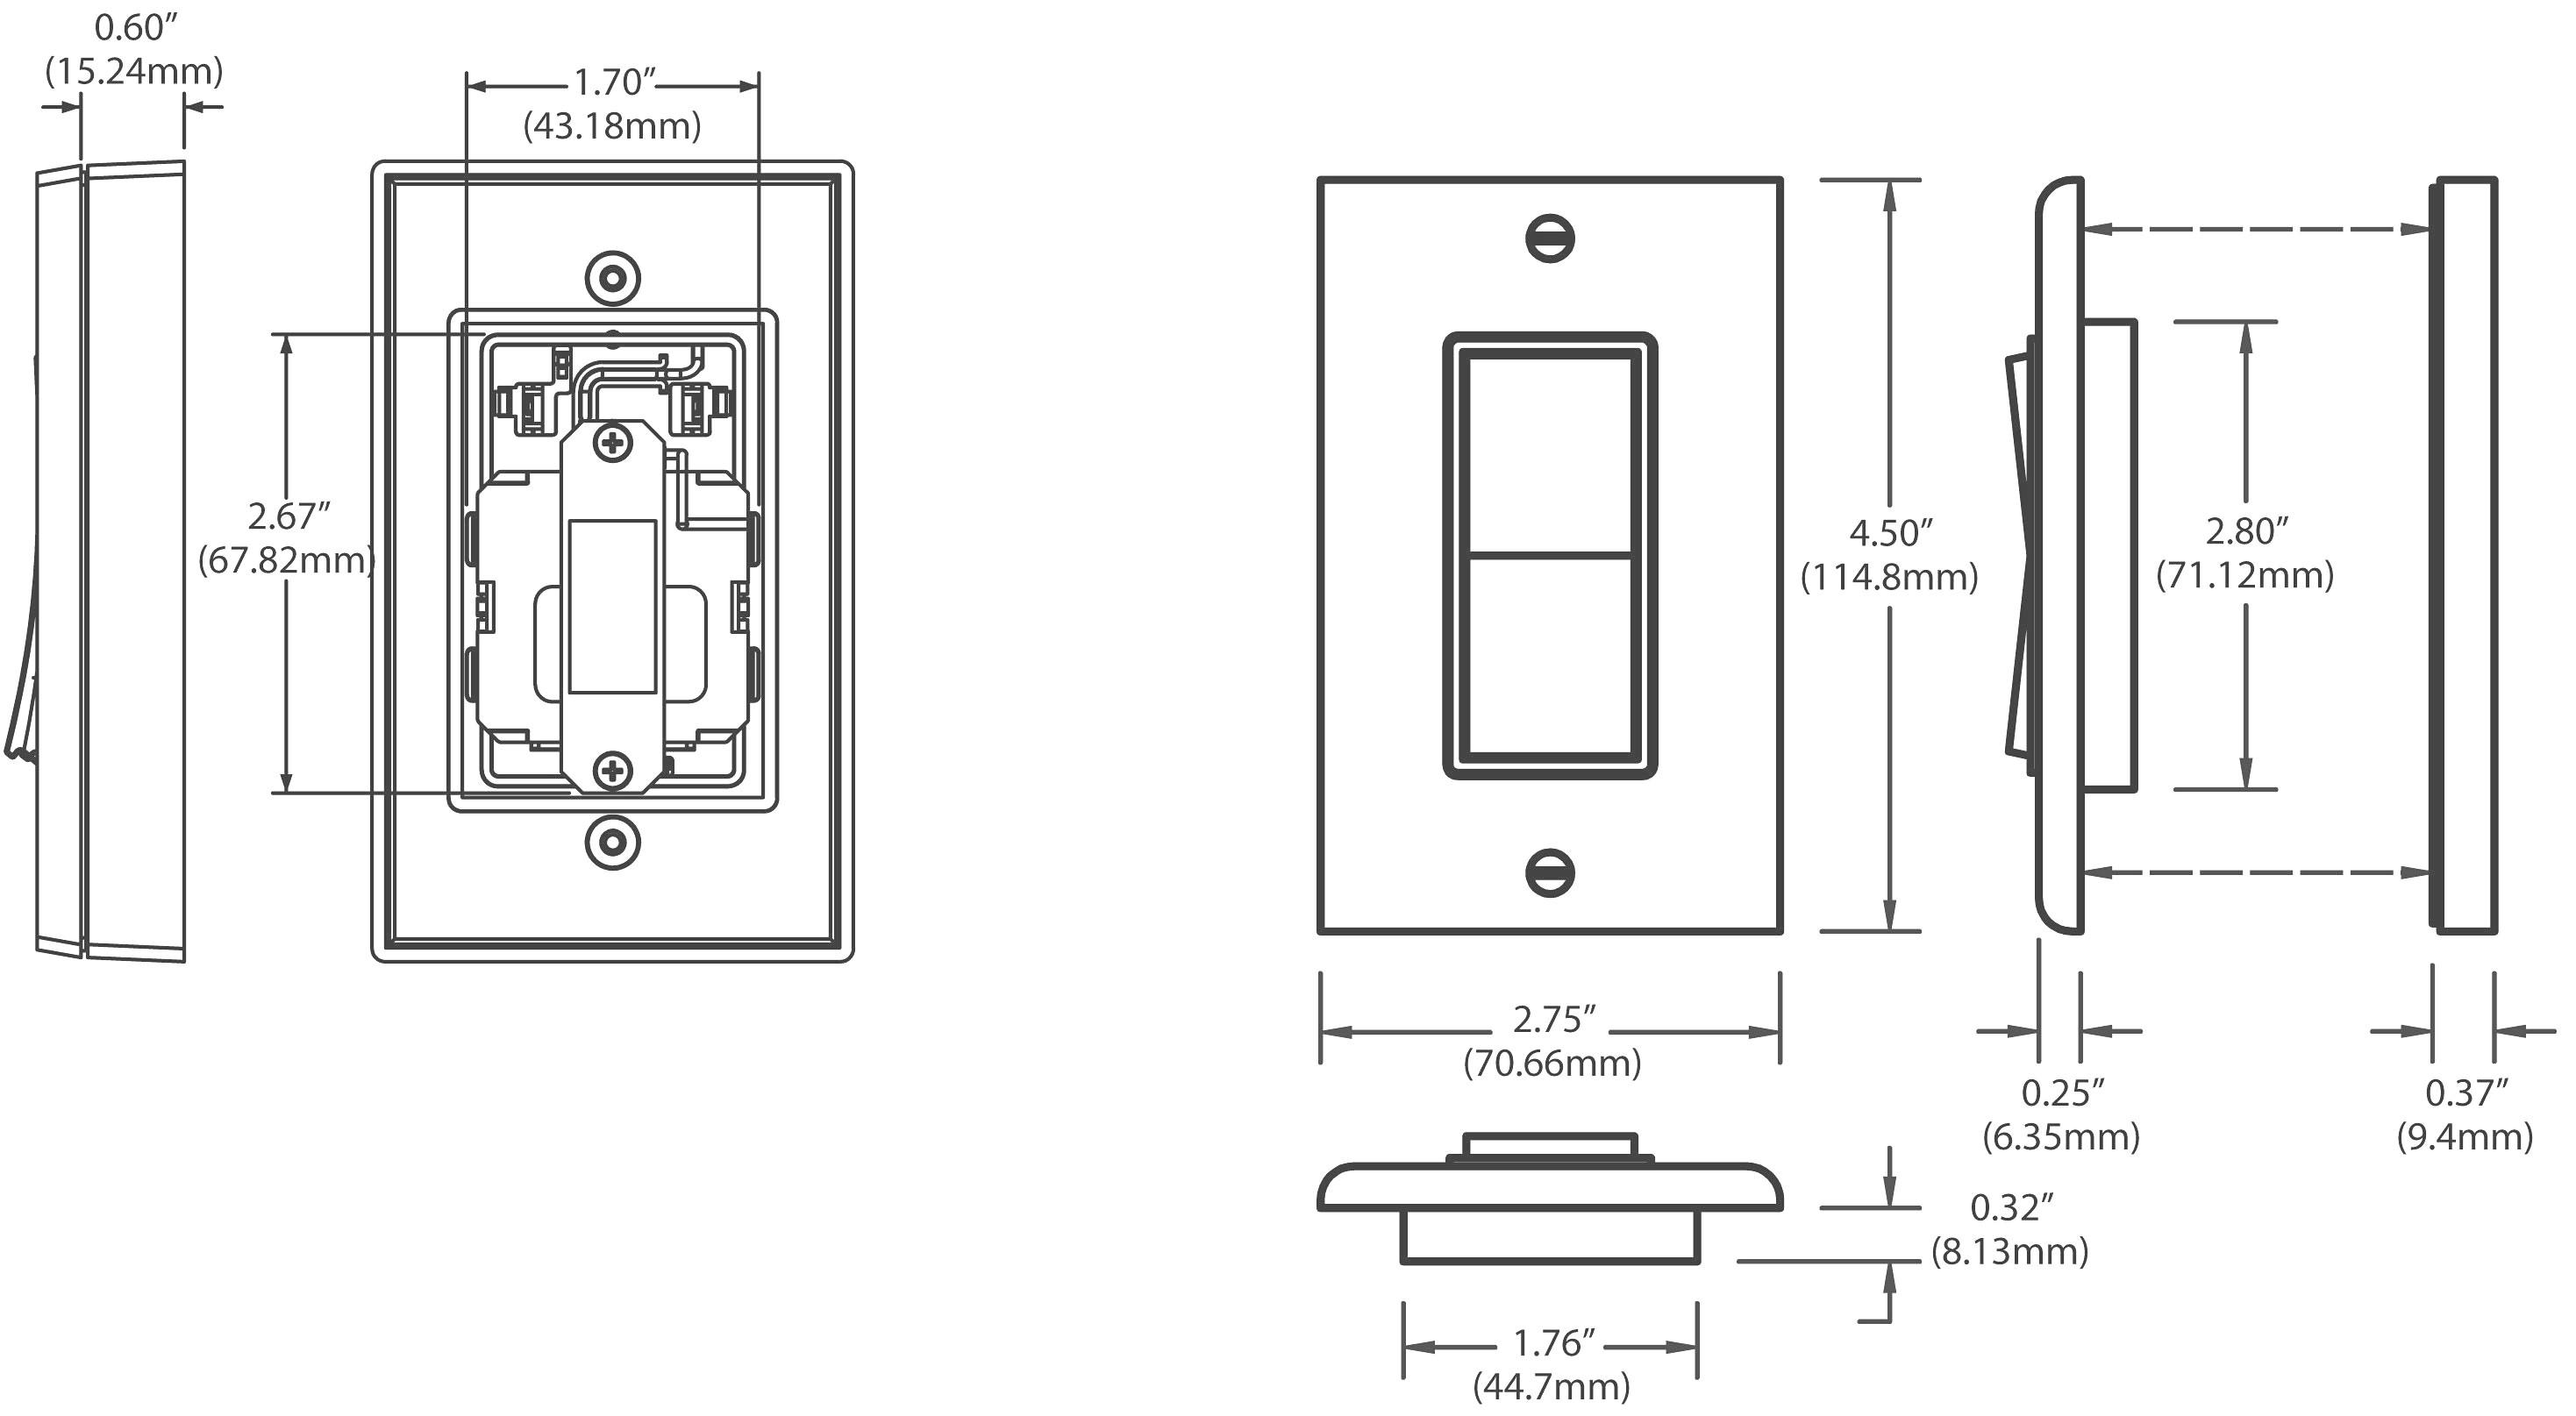 Leviton Dimmer Wiring Diagram Way Dimmers Rocker 3 Switch Decora Full